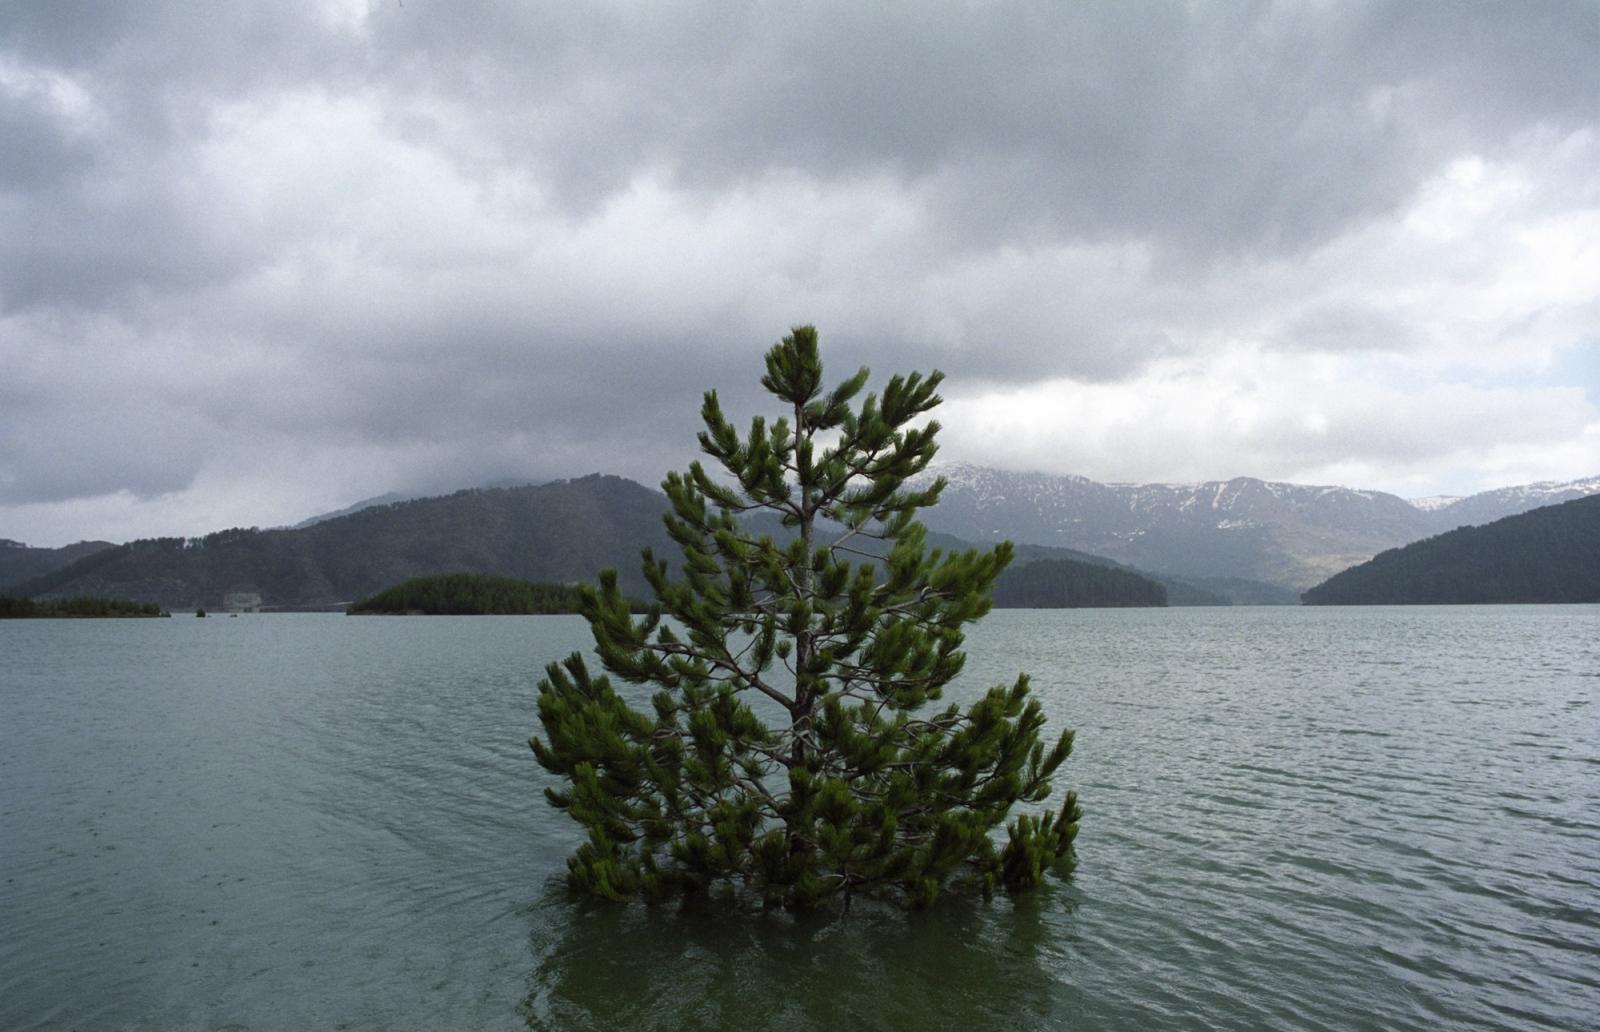 Drowning tree. Near Metsovo, northwestern Greece.